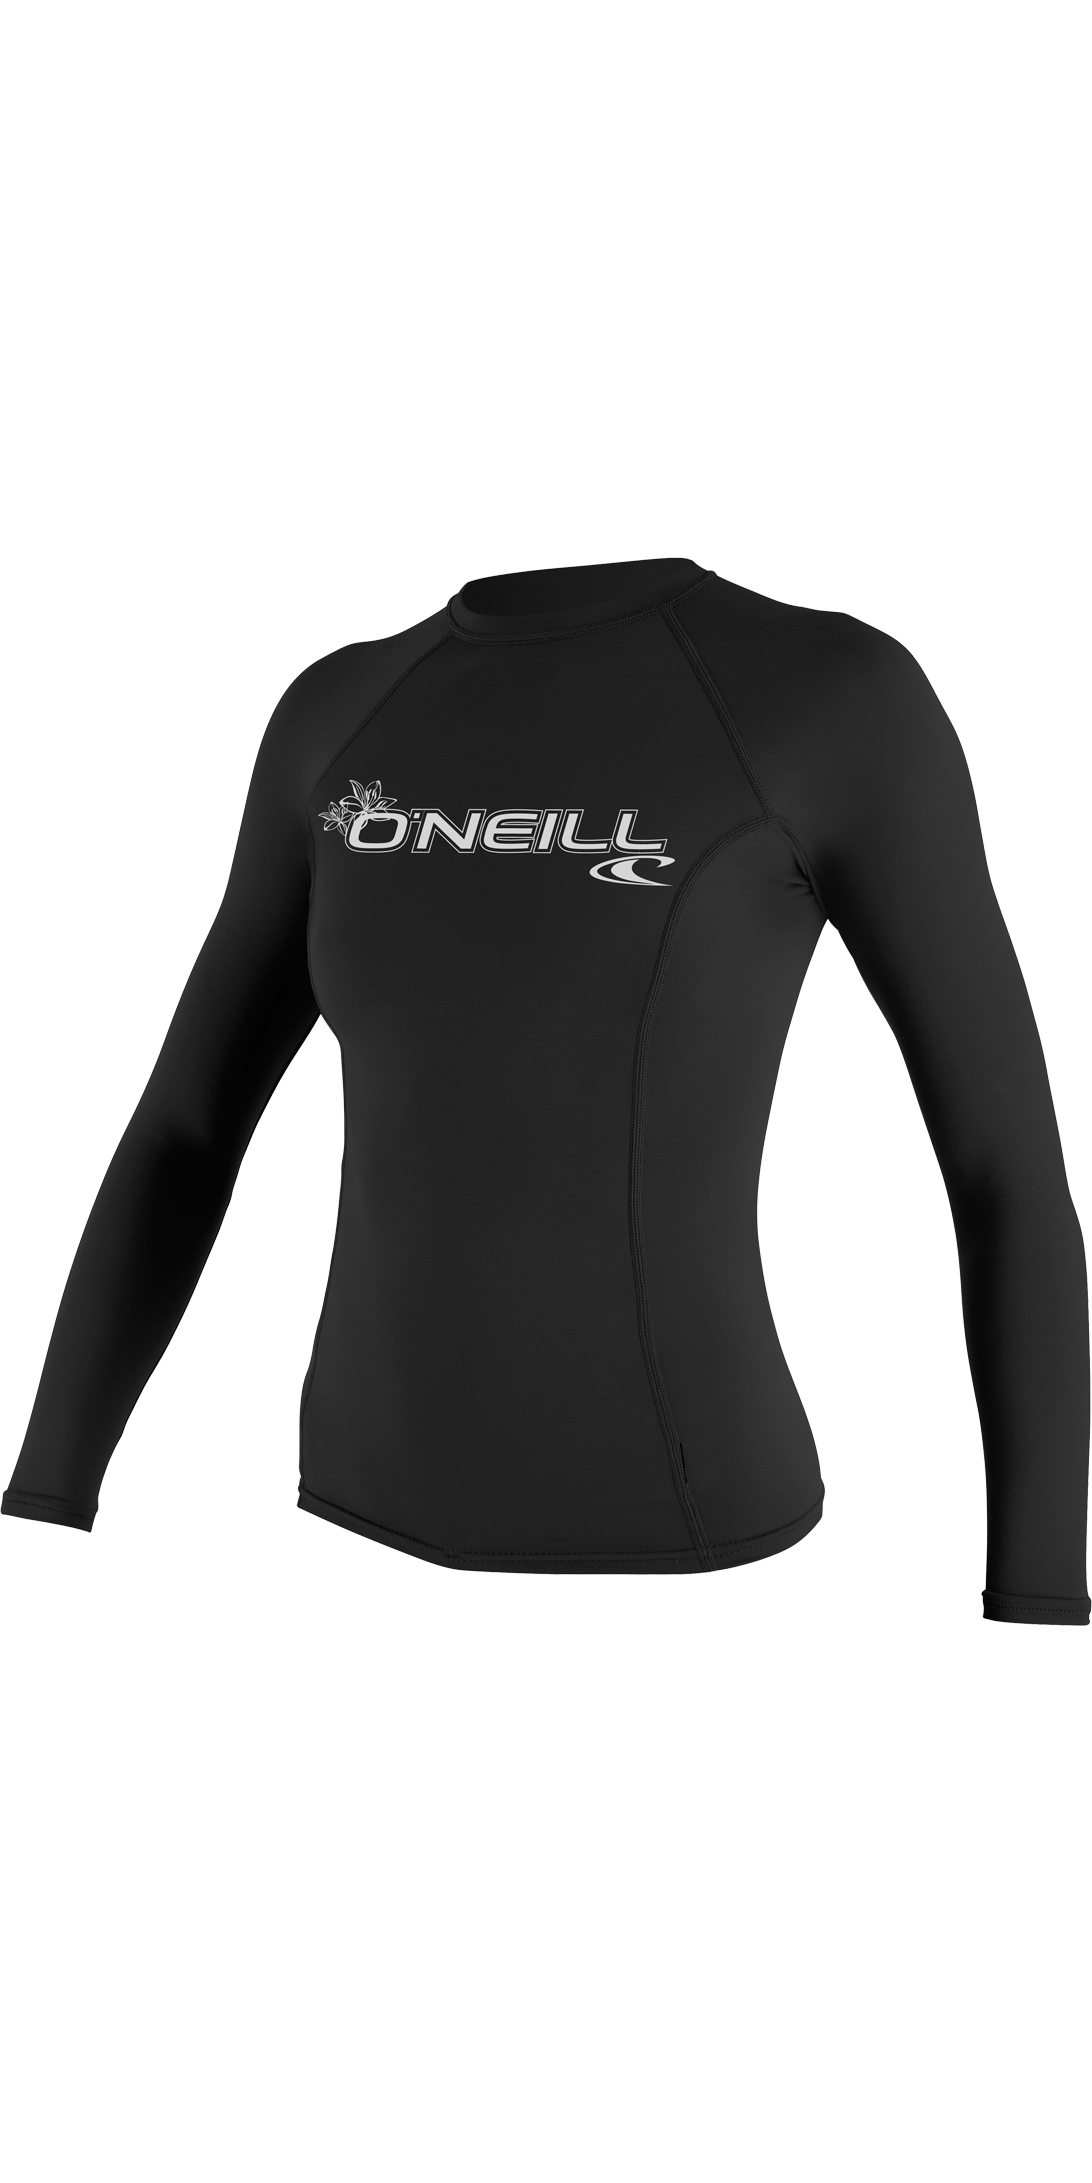 2019 O'Neill Womens Basic Skins Long Sleeve Crew Rash Vest BLACK 3549